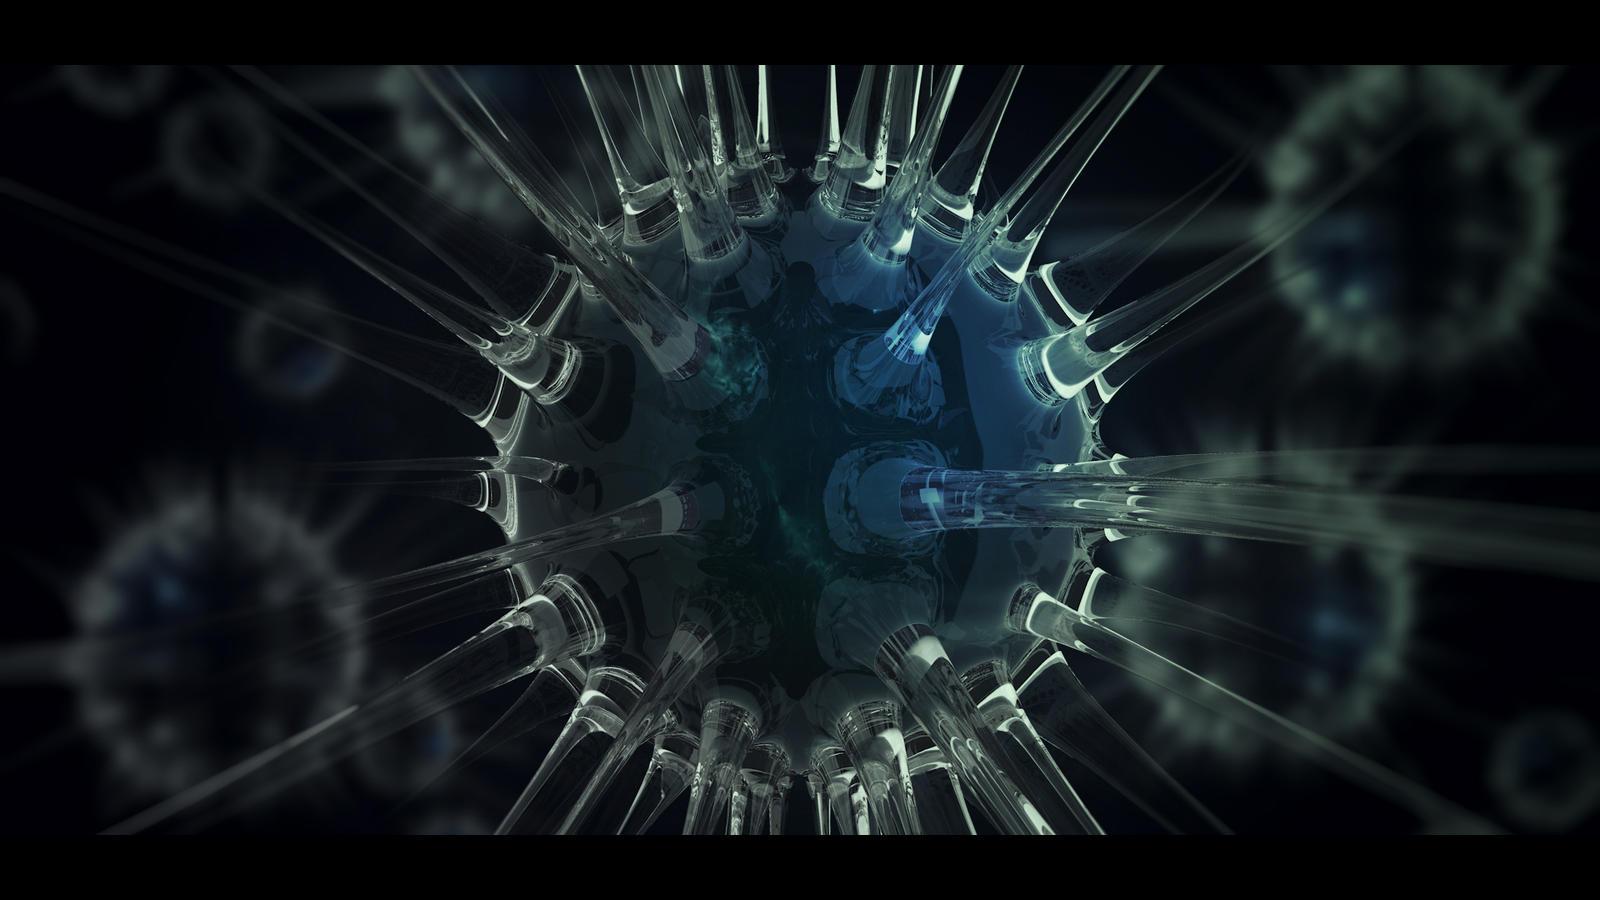 Hd wallpaper virus - Tech Virus By Aceshd Tech Virus By Aceshd